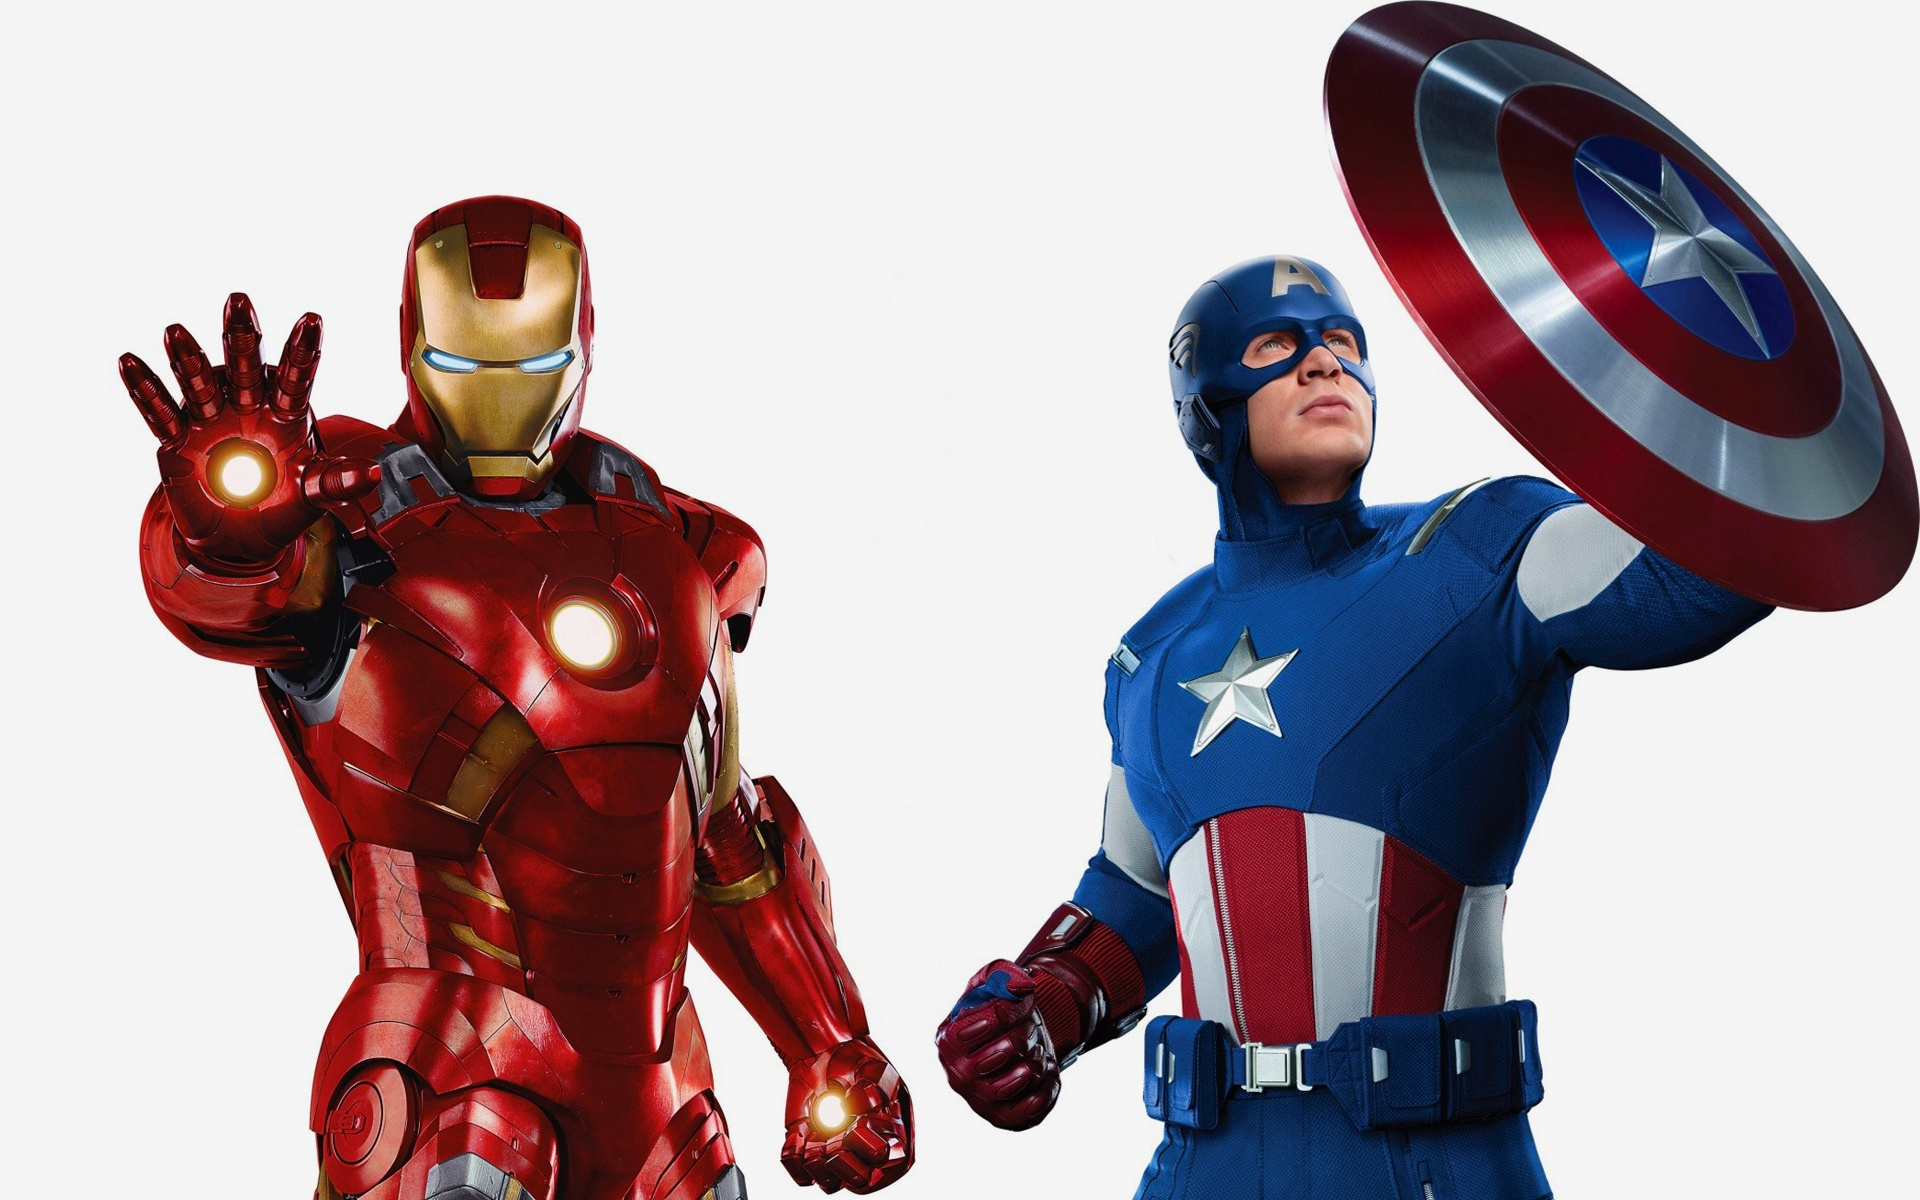 Download Wallpaper 1920x1200 The Avengers Iron Man